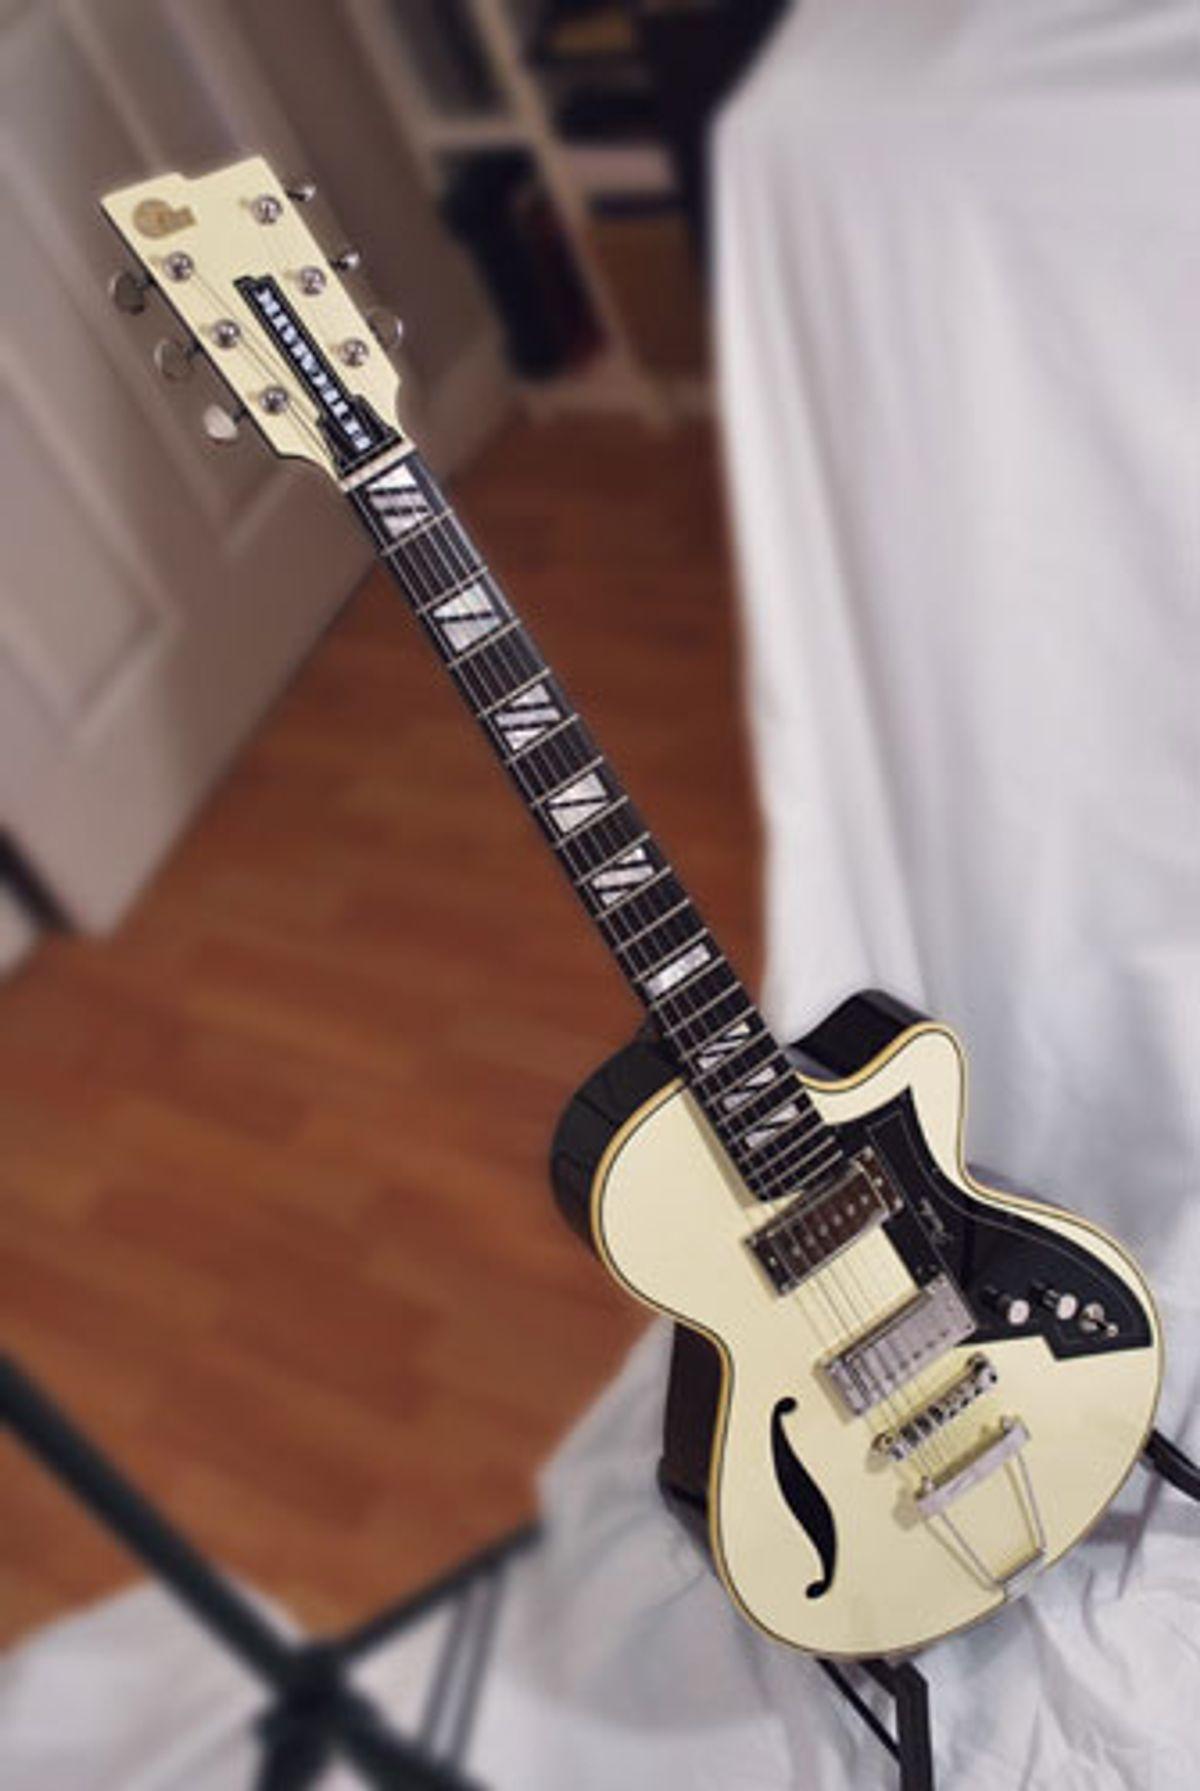 Peerless Guitars Introduces Retromatic 131 and B Series Basses